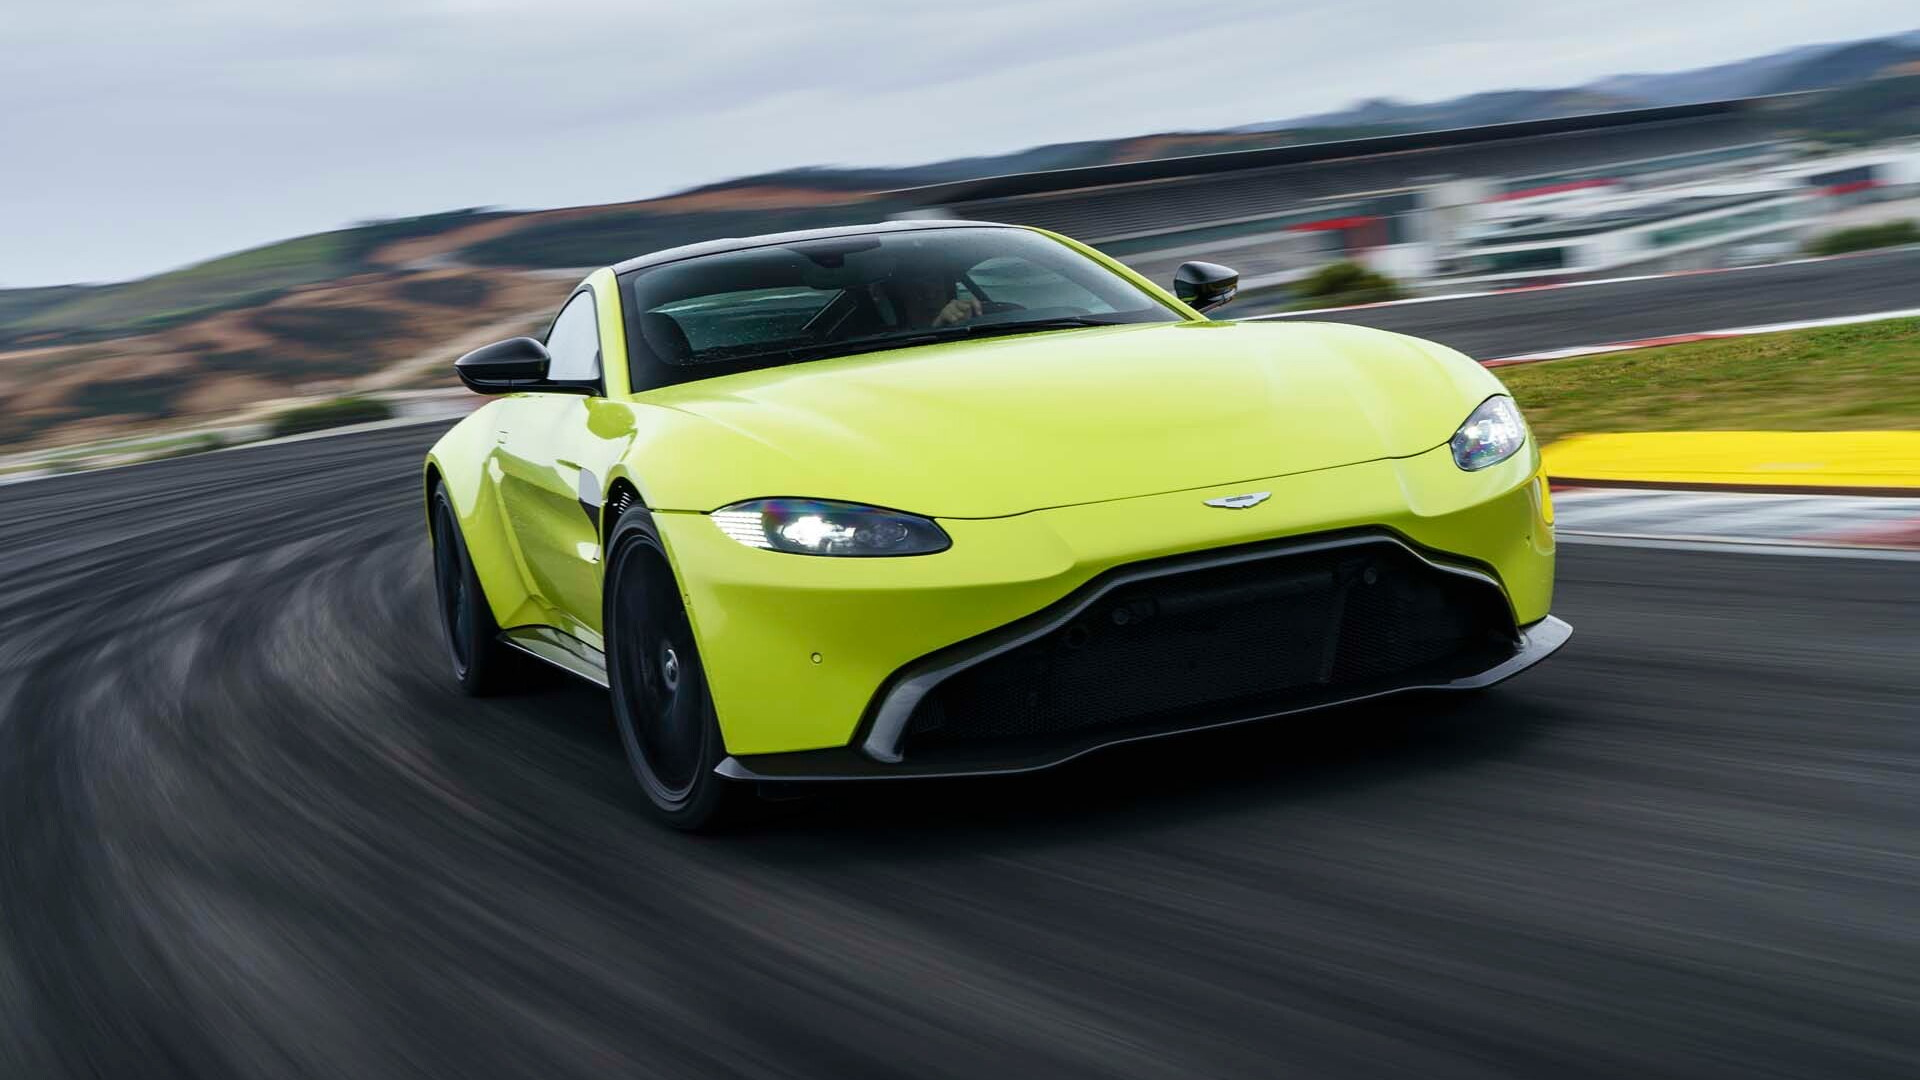 Best Car To Buy 2019 Motor Authority